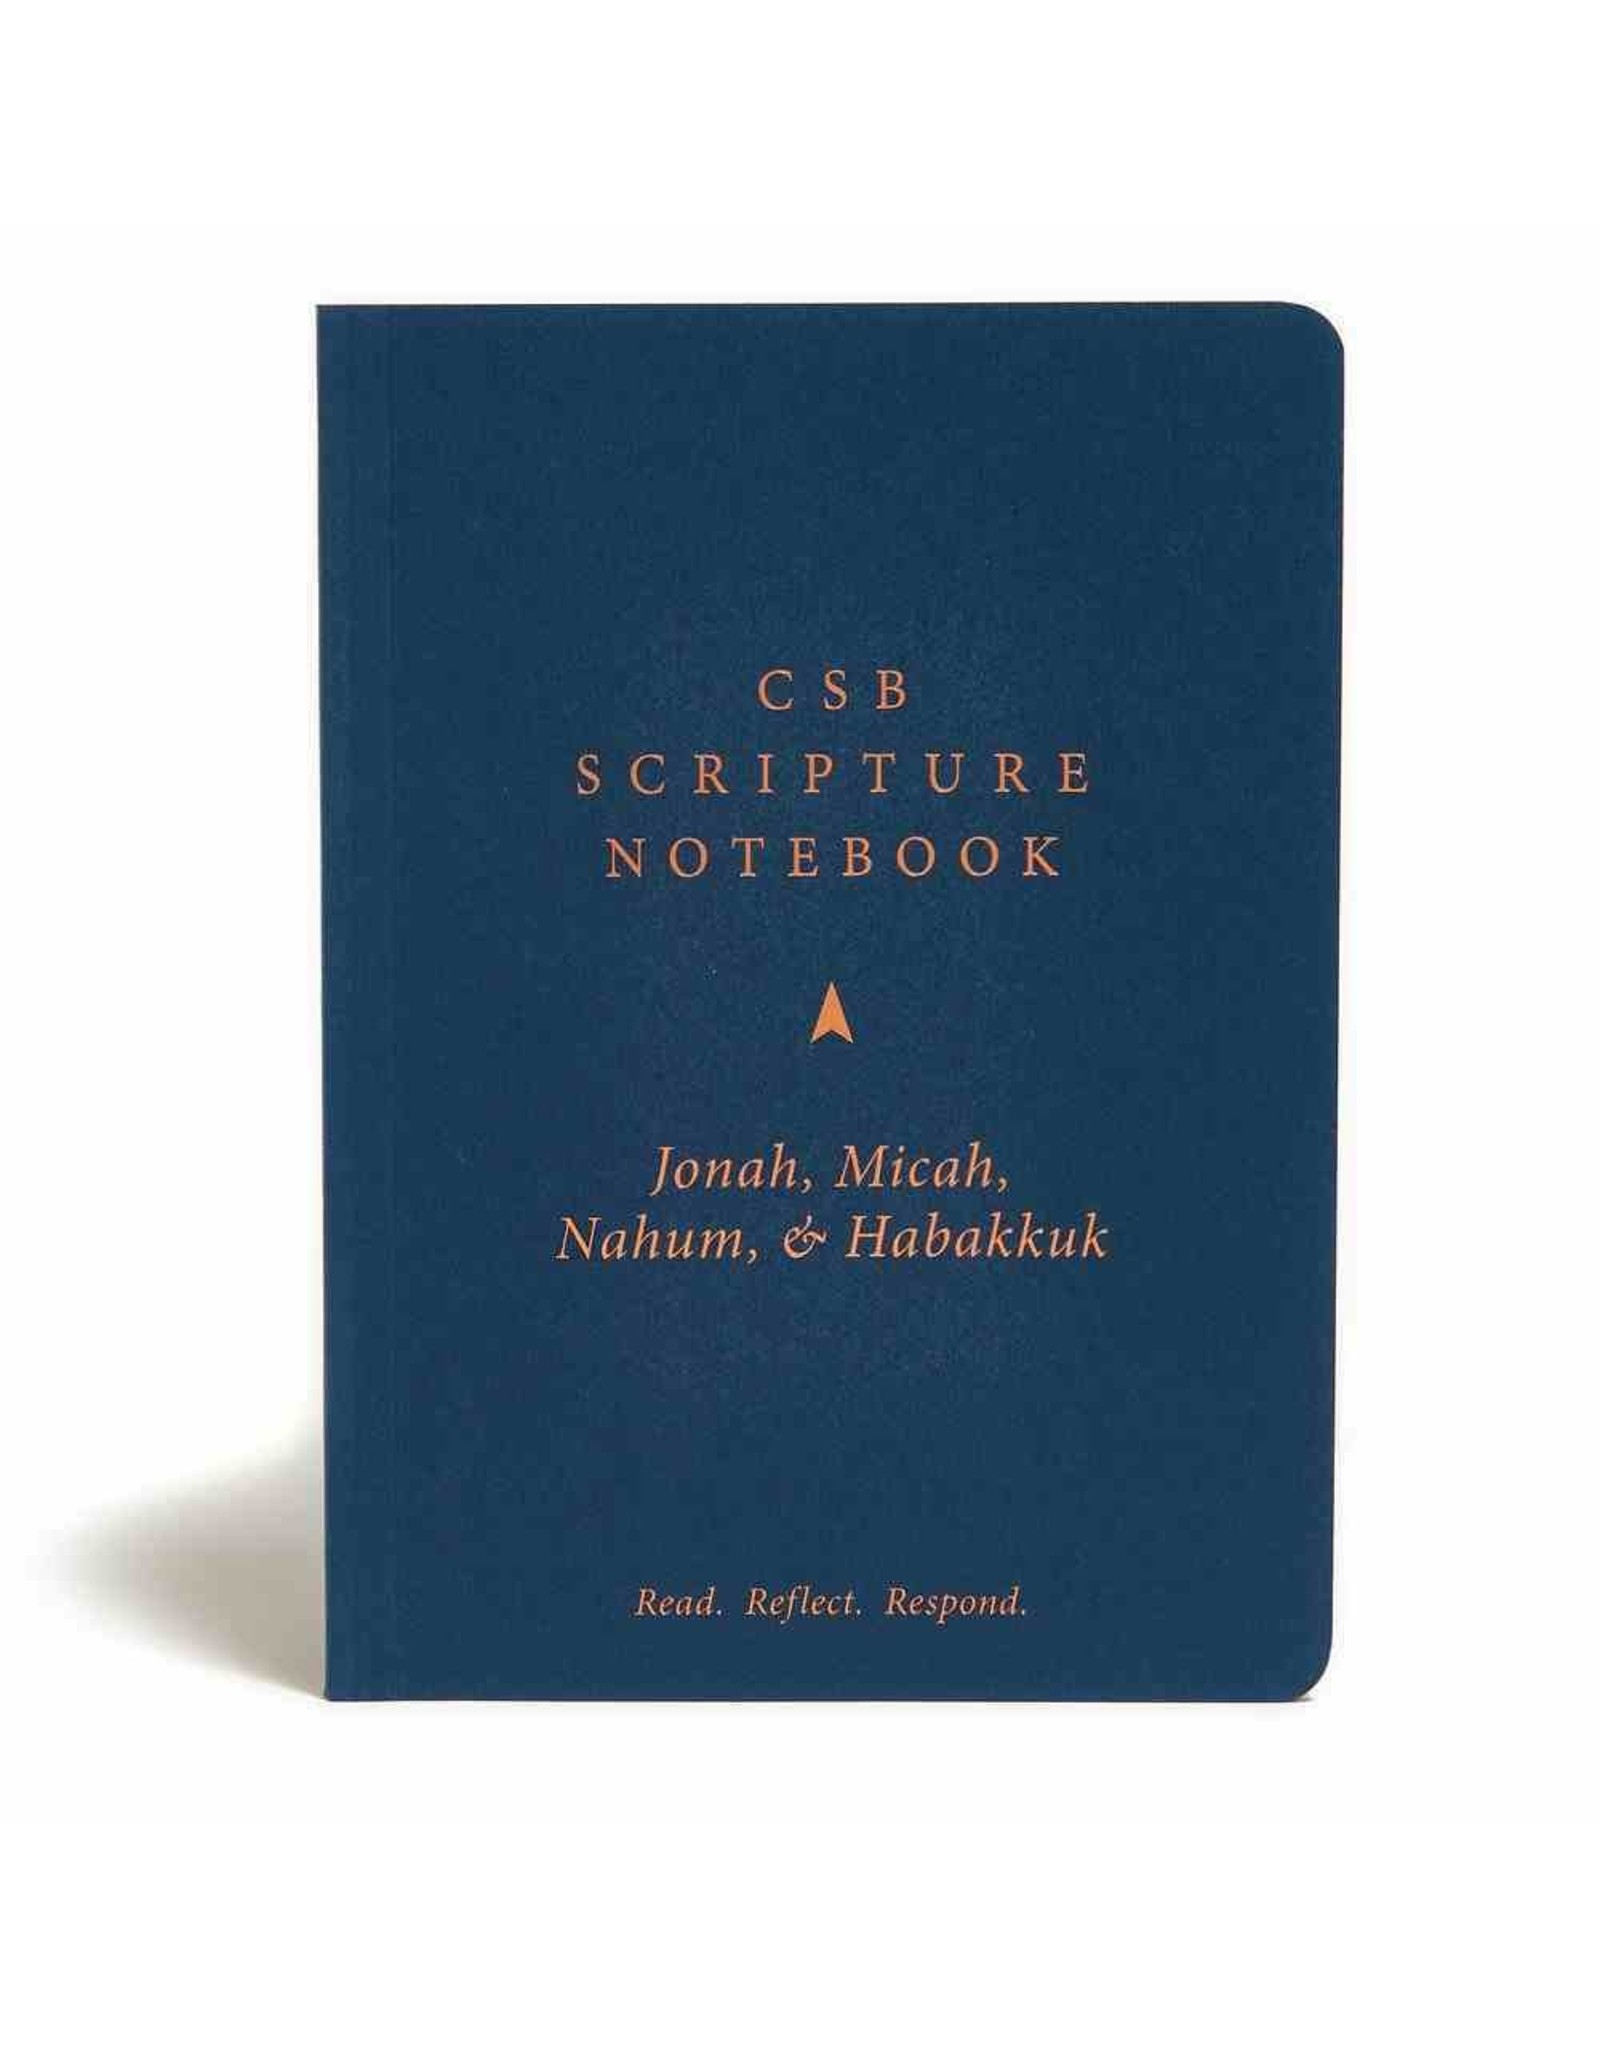 Holman CSB SCripture Notebook - Jonah, Michah, Nahum & Habbukuk